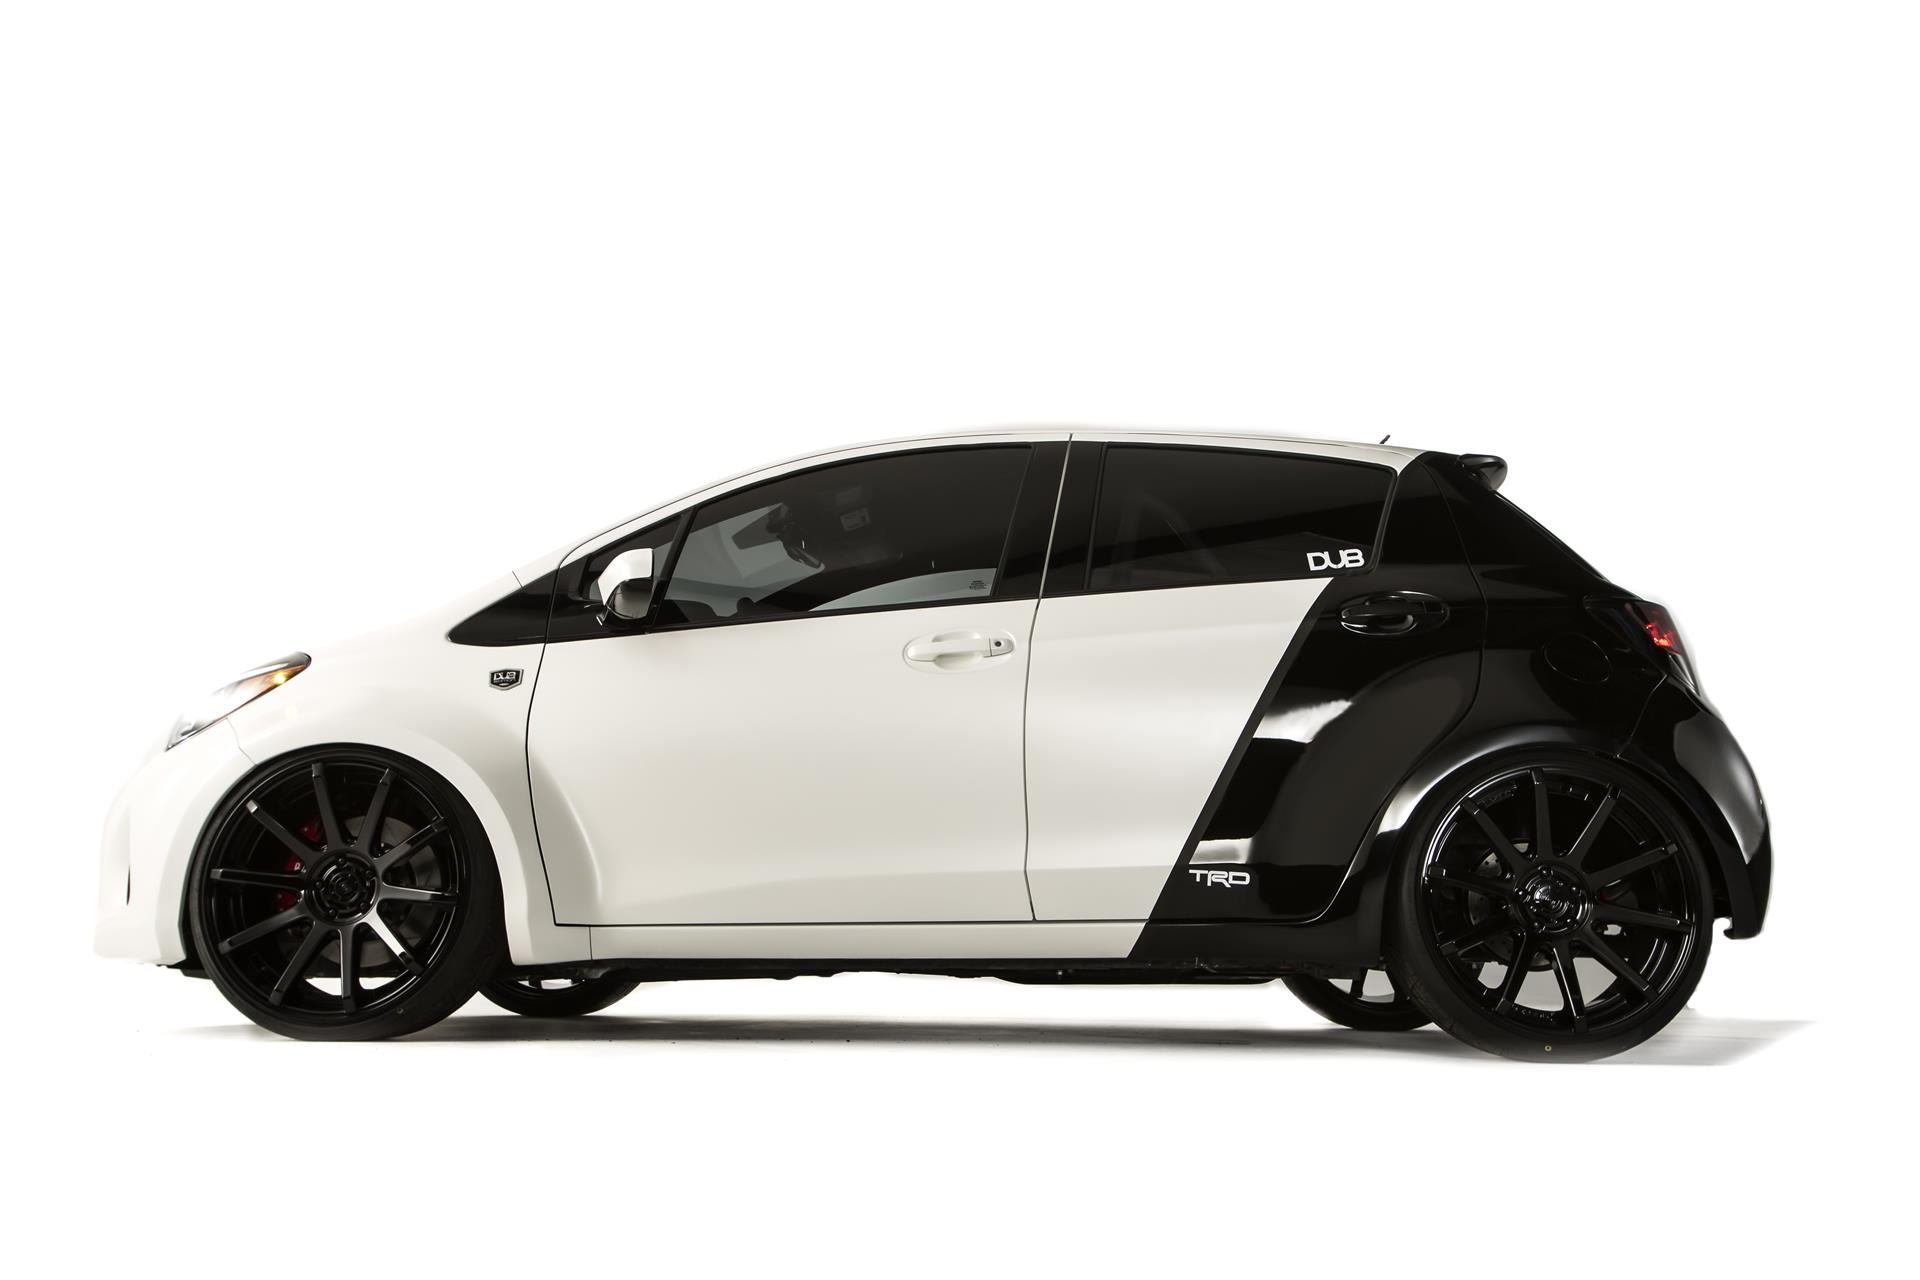 2014 Toyota Yaris Dub Edition Conceptcarz Com